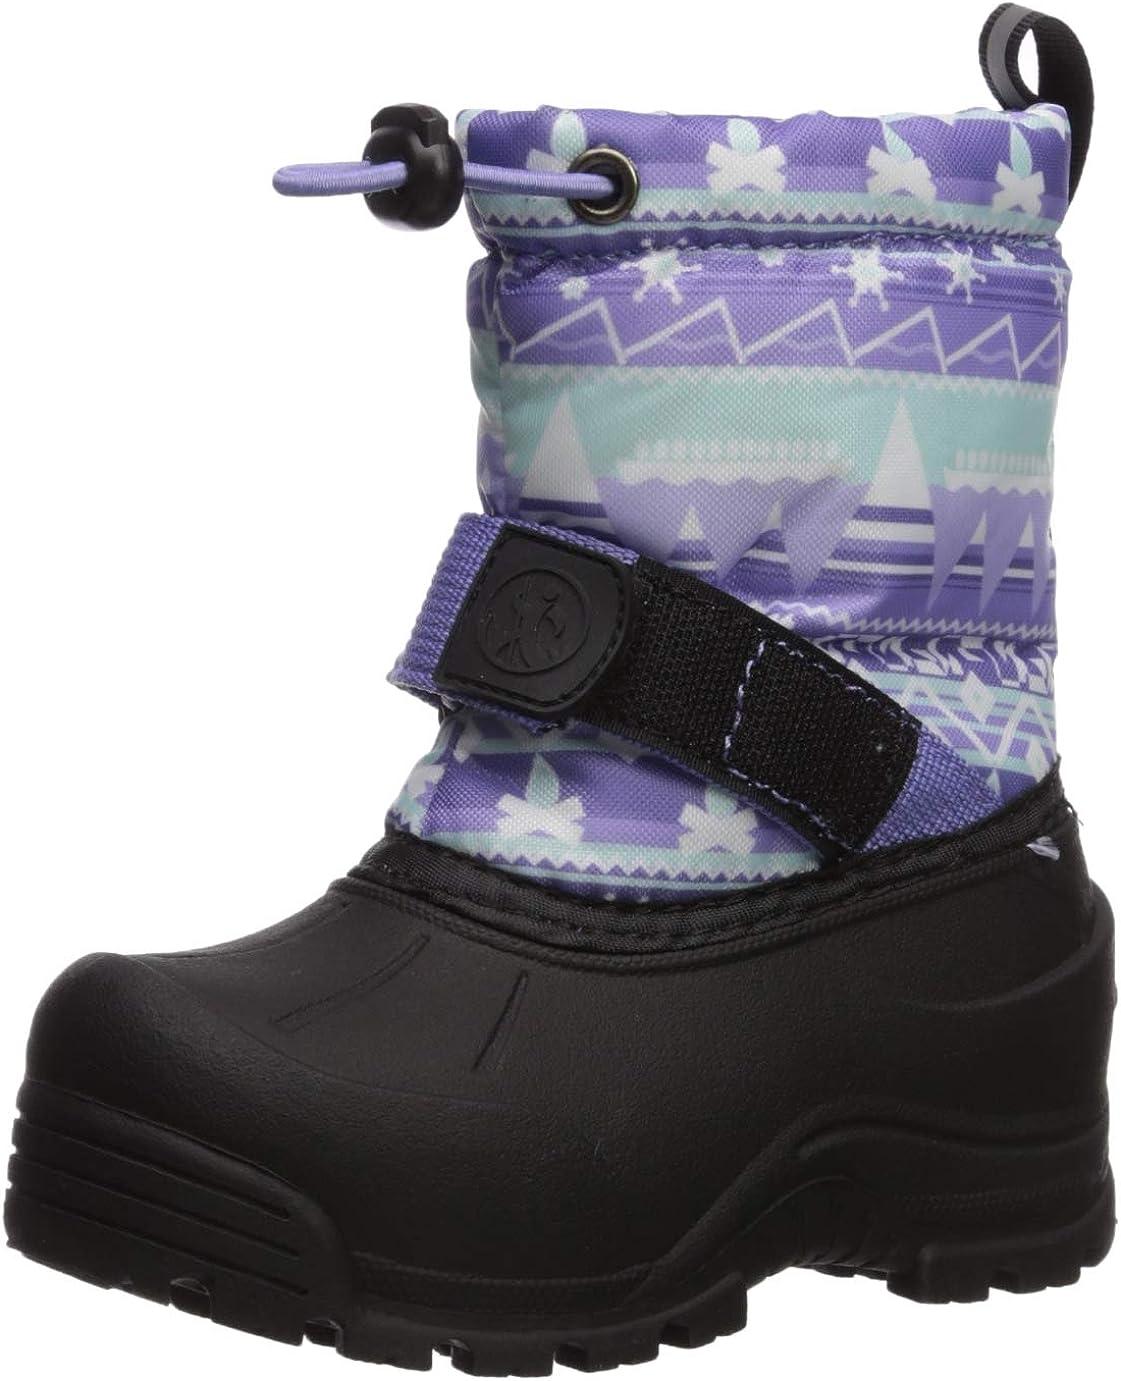 Echo Bay Frosty 5 ☆ popular Girls' Weather Boot Max 74% OFF Purple